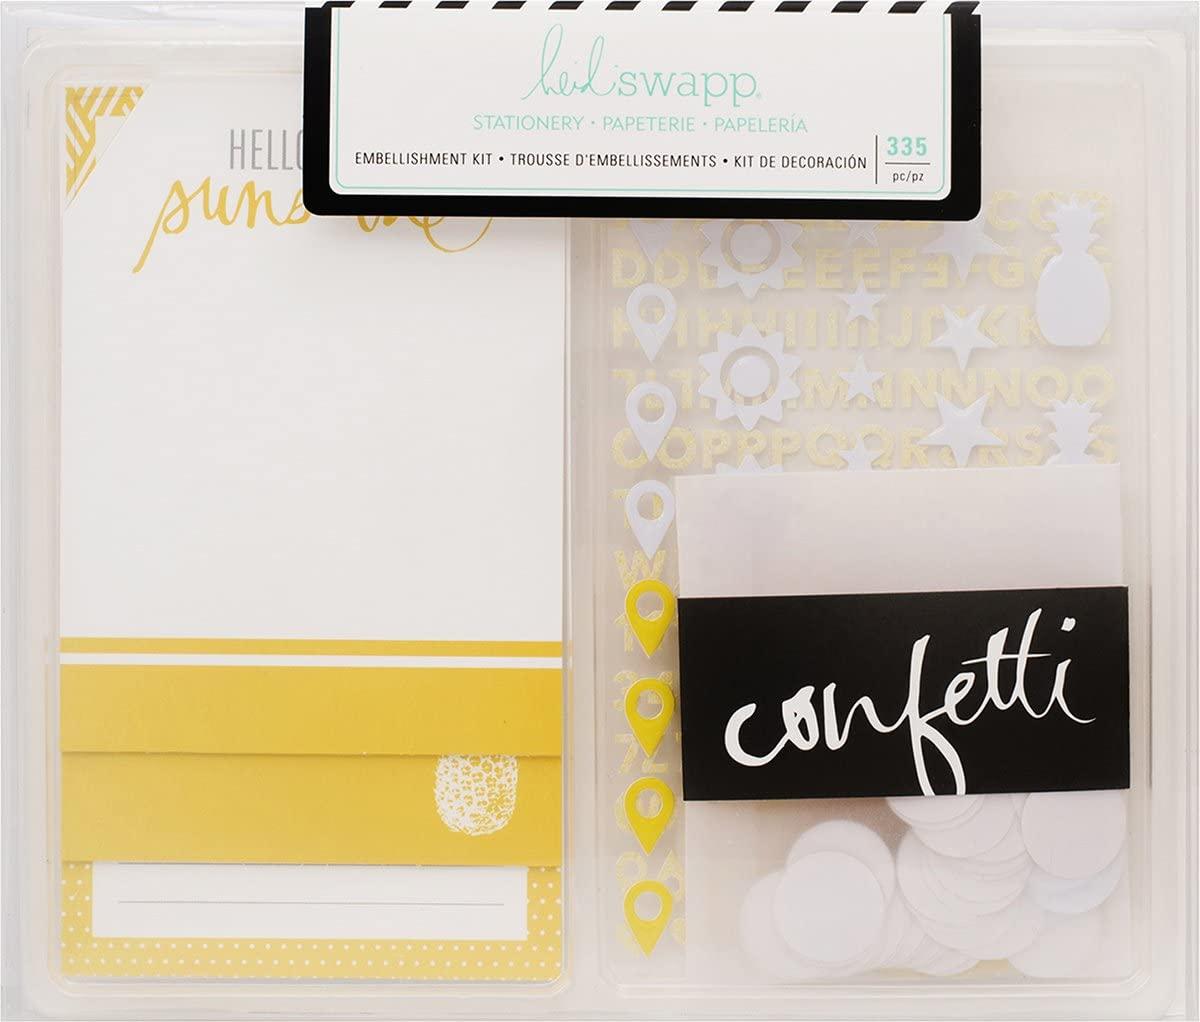 American Crafts 313328 Heidi Swapp Stationery Embellishment Kit